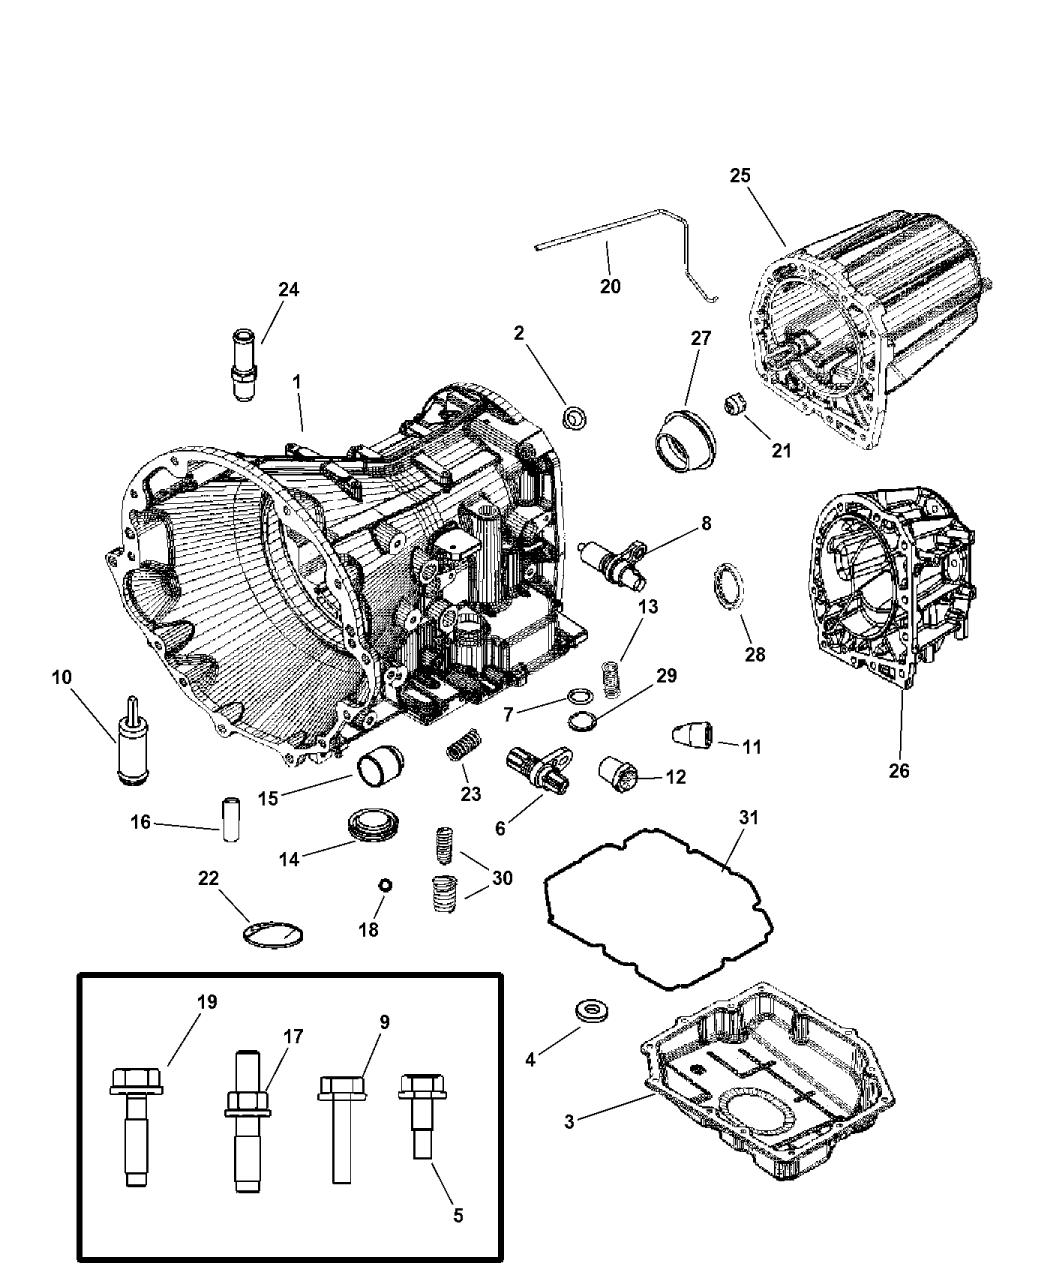 dodge nitro transmission diagram dodge nitro fuse diagram